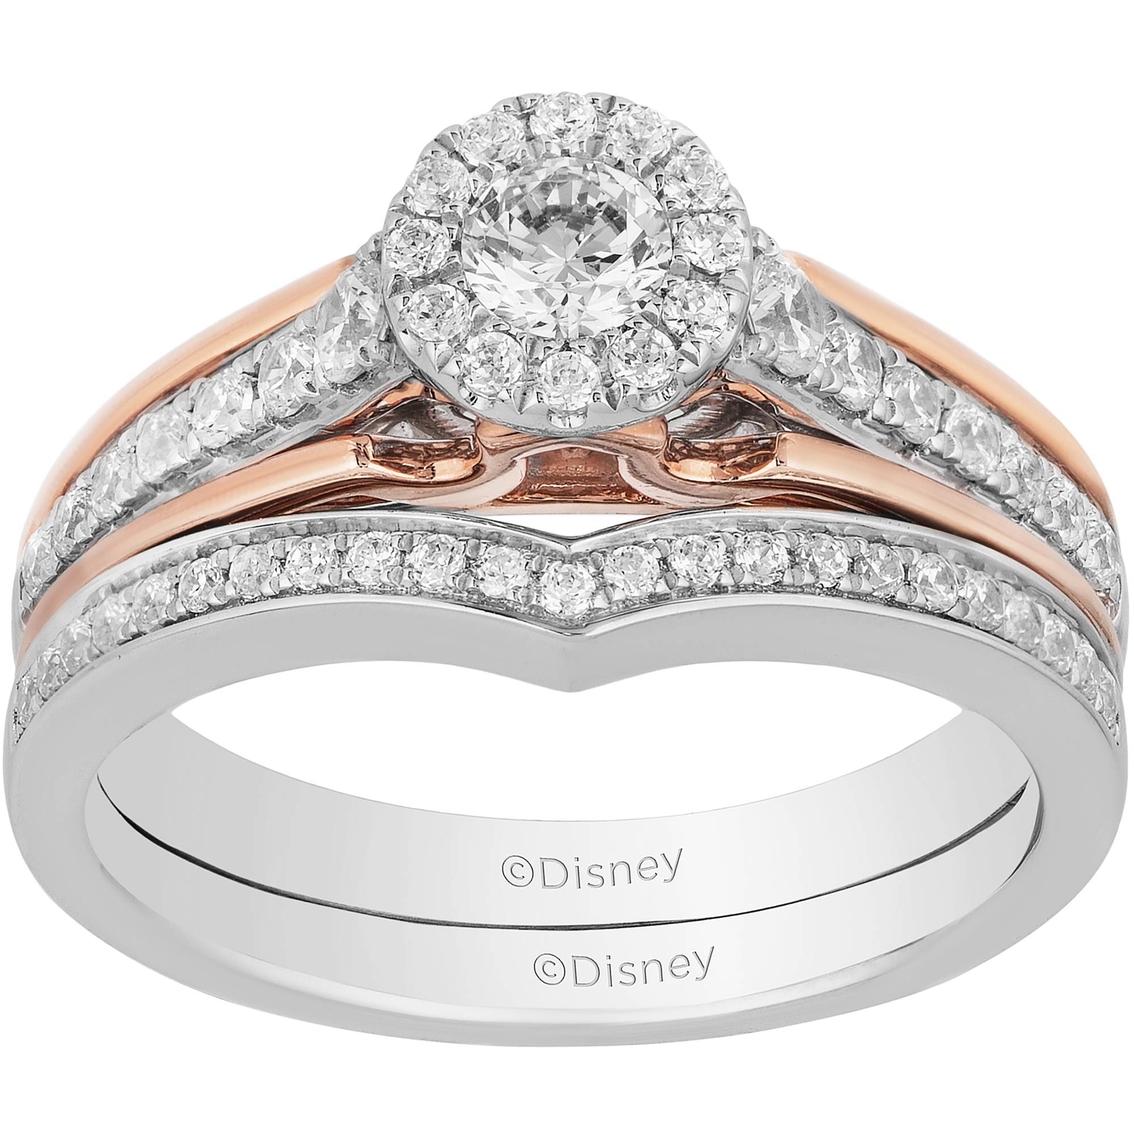 Disney Enchanted 10k White And Rose Gold 5 8 Ctw Diamond Aurora